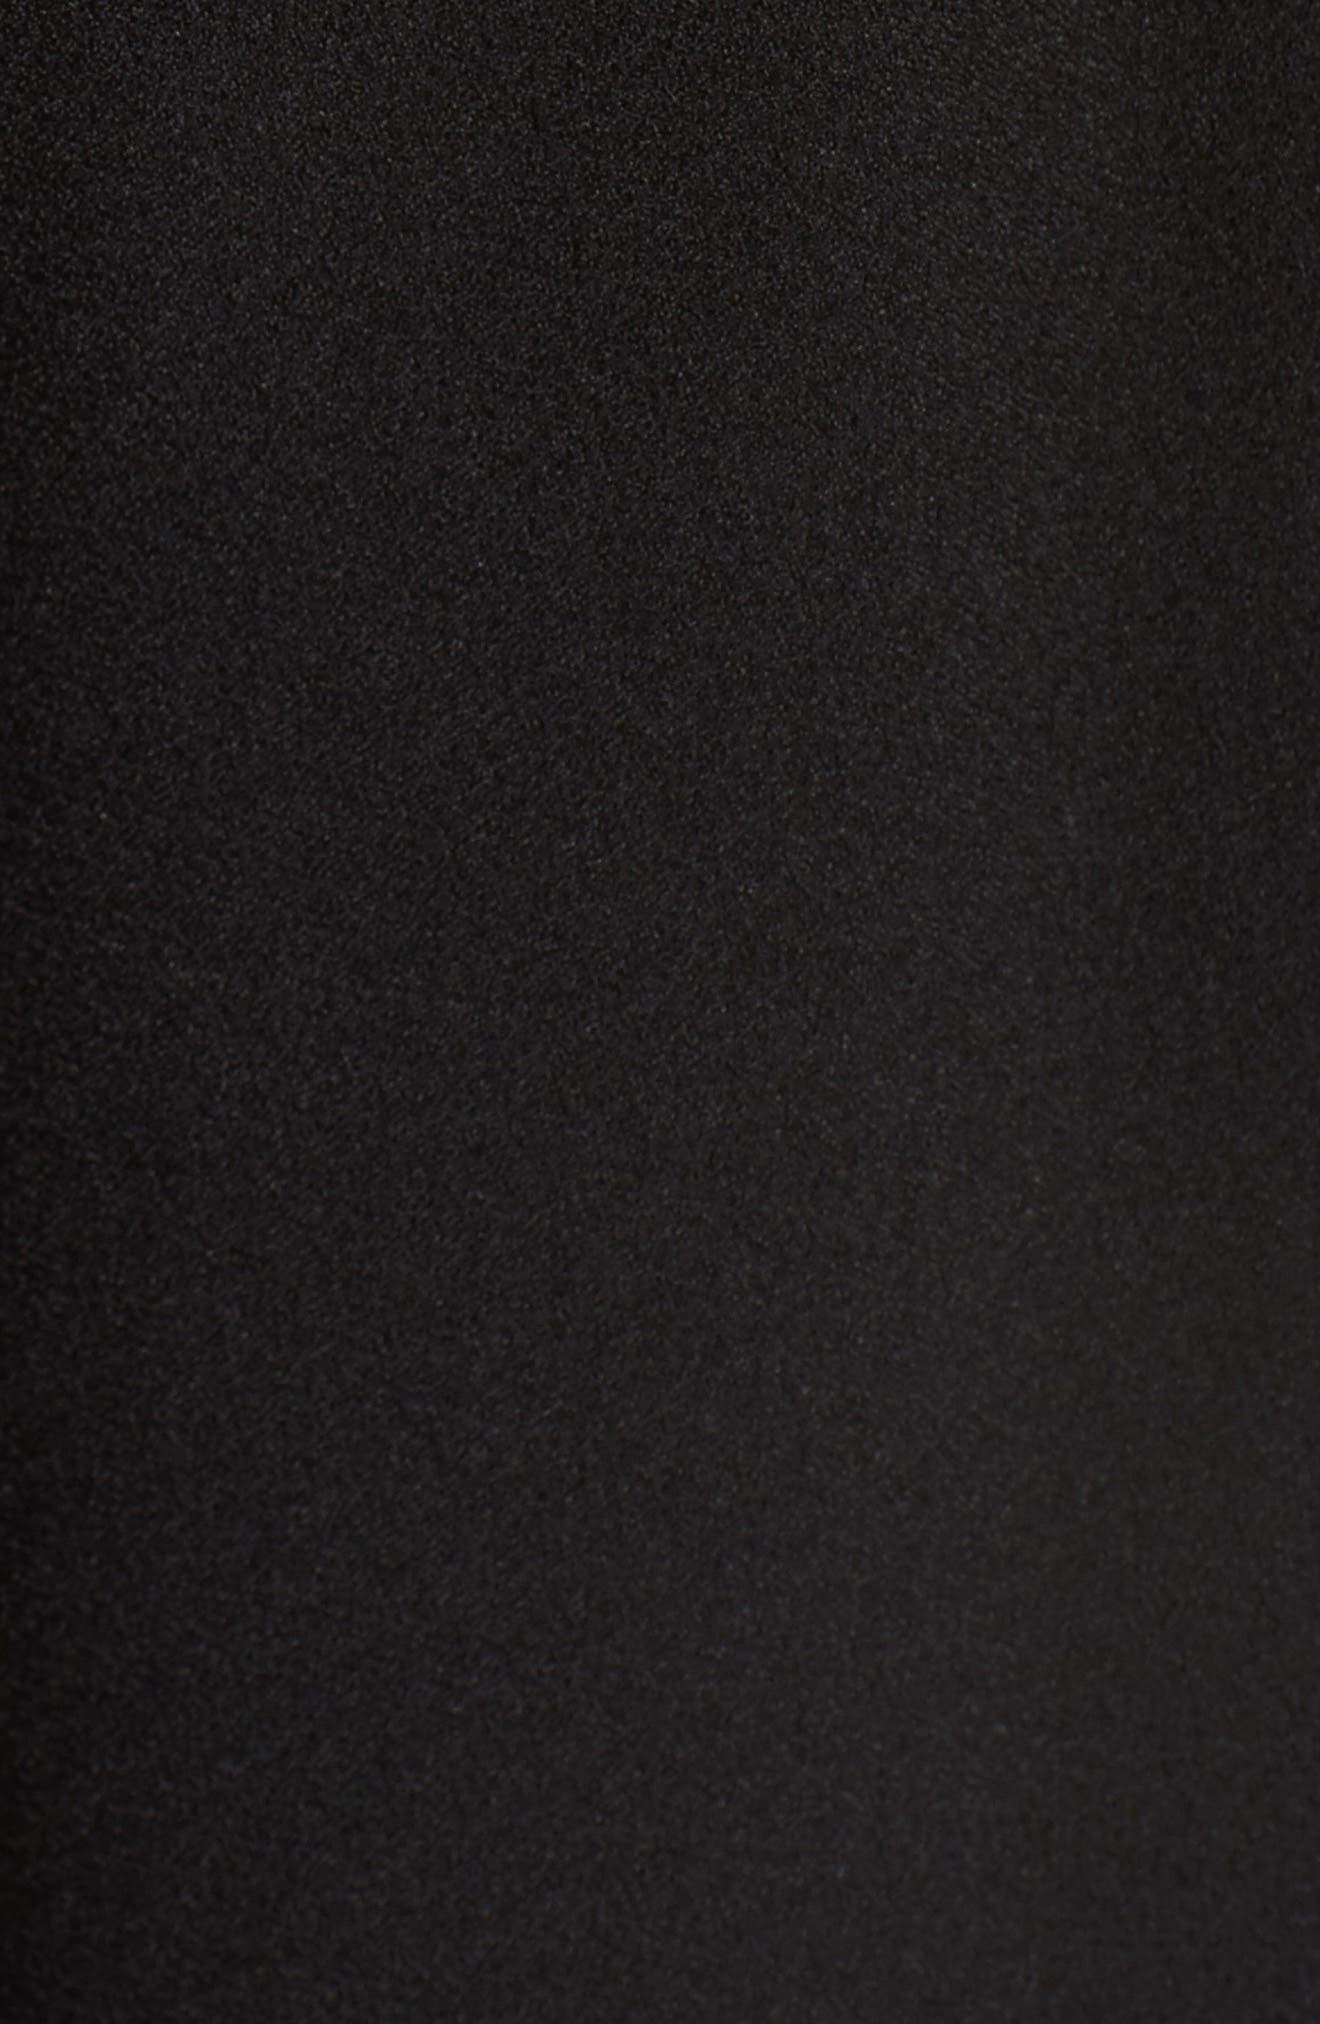 Embellished Ruffle Jumpsuit,                             Alternate thumbnail 5, color,                             Black